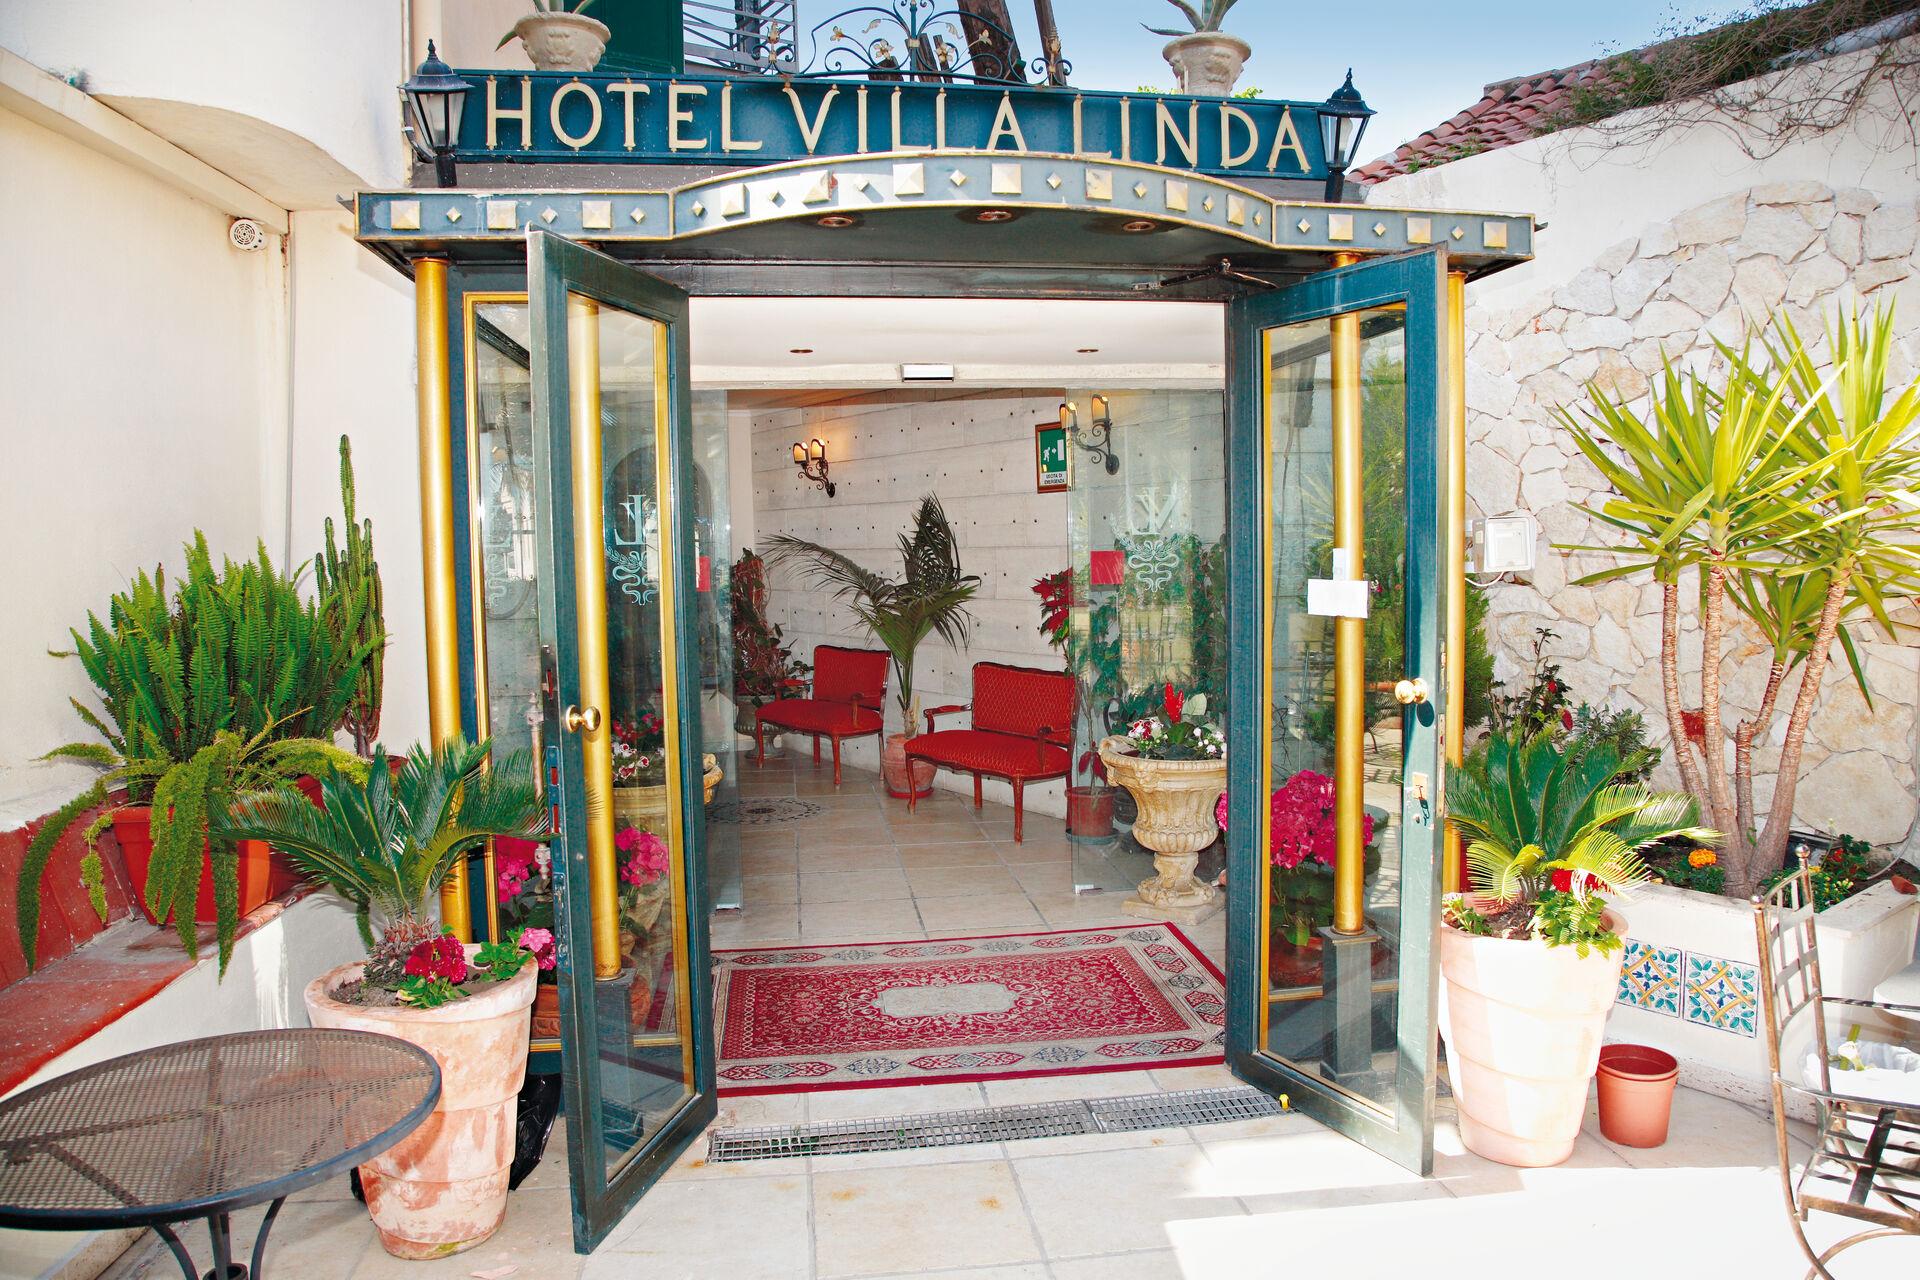 Italie - Sicile - Hôtel Villa Linda 3*